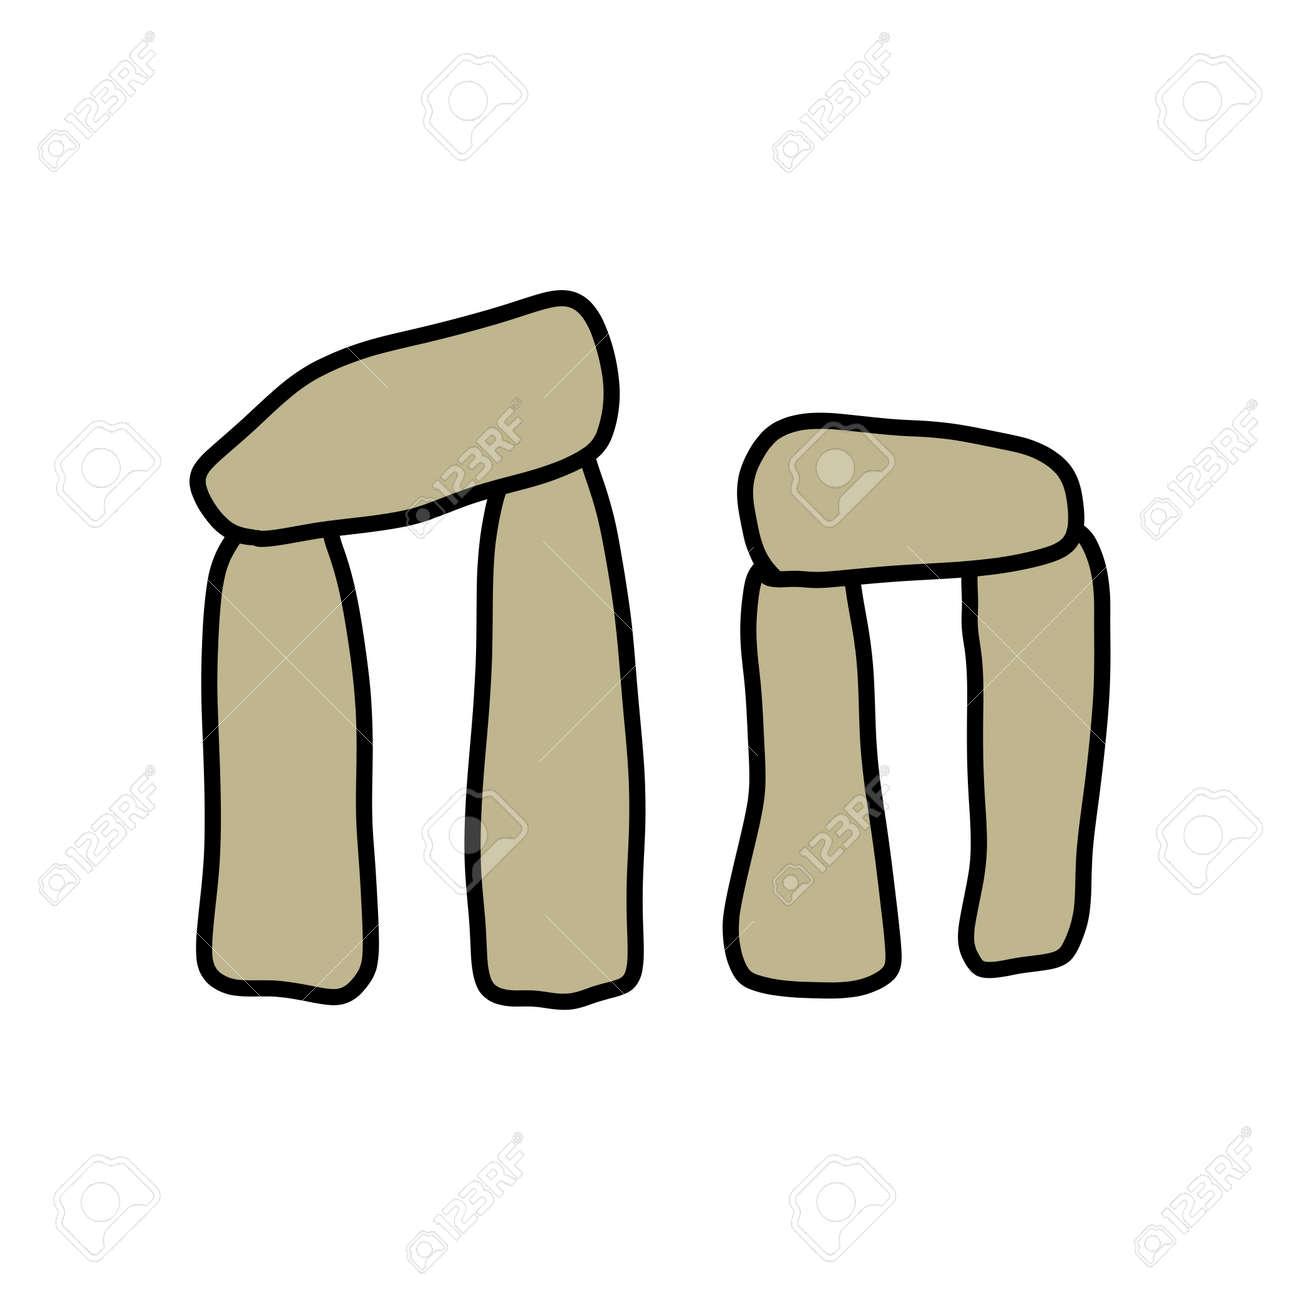 Stonehenge doodle icon, vector illustration - 170945355